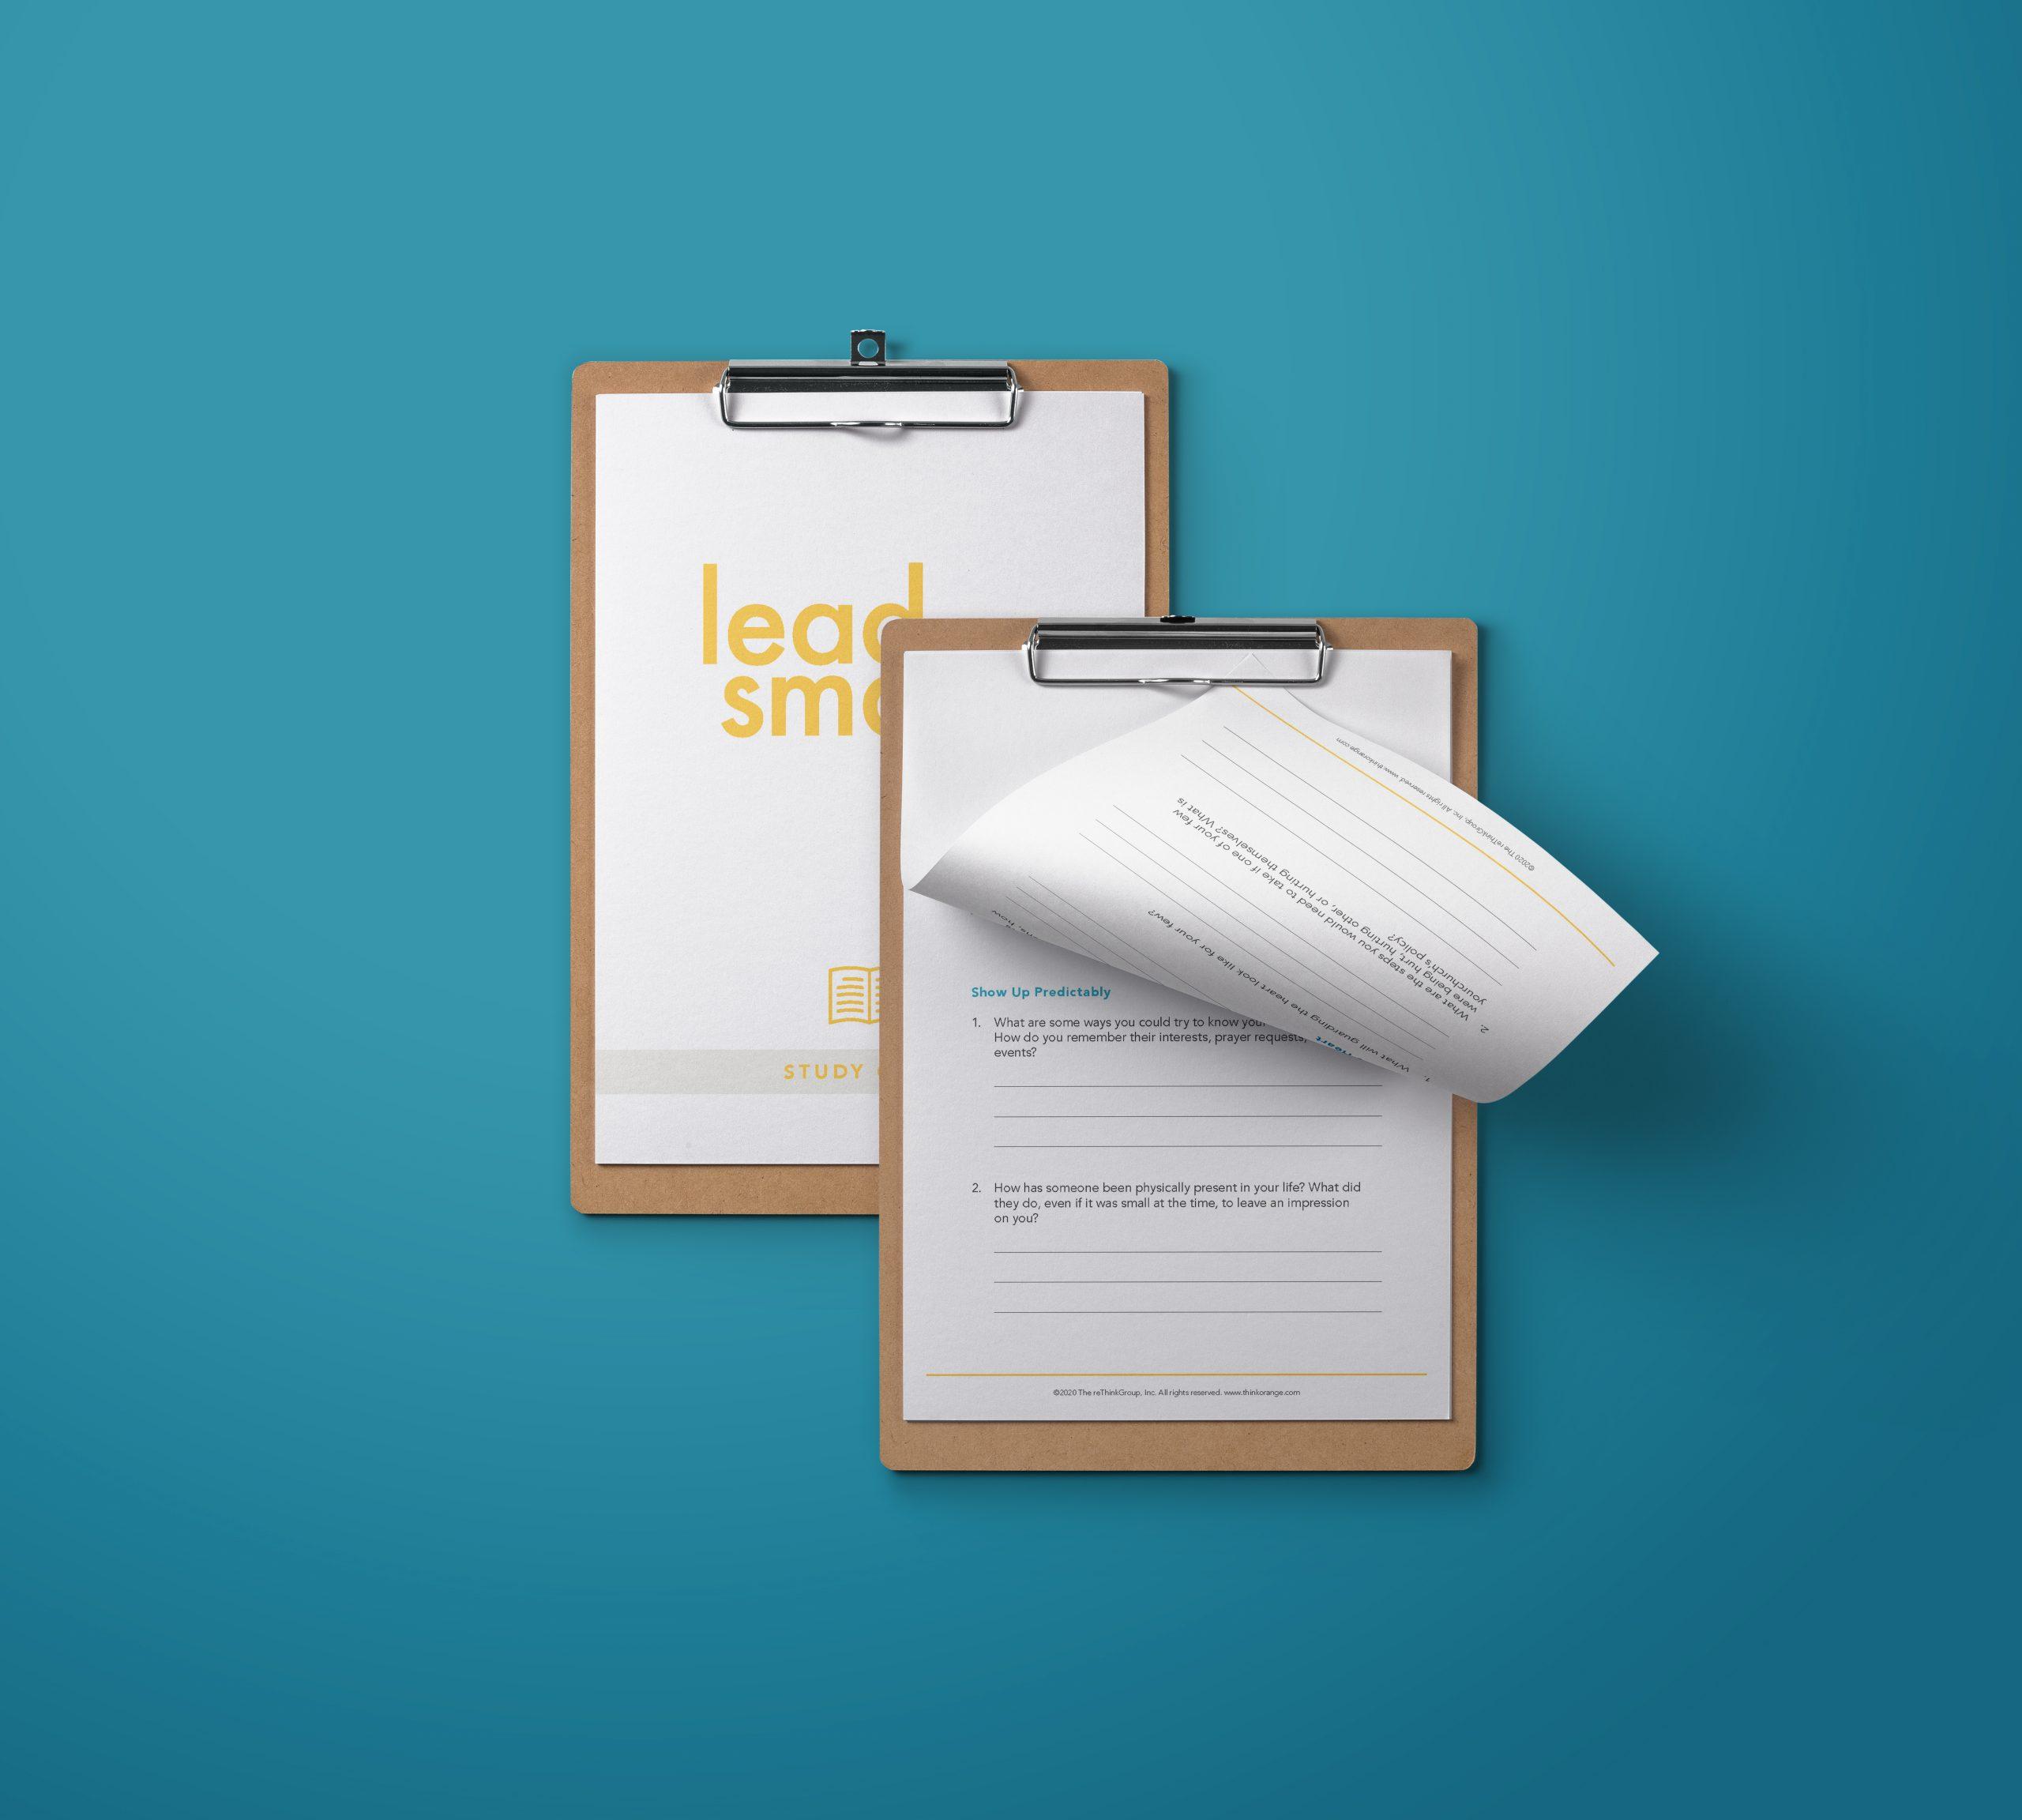 Lead Small Study Guide